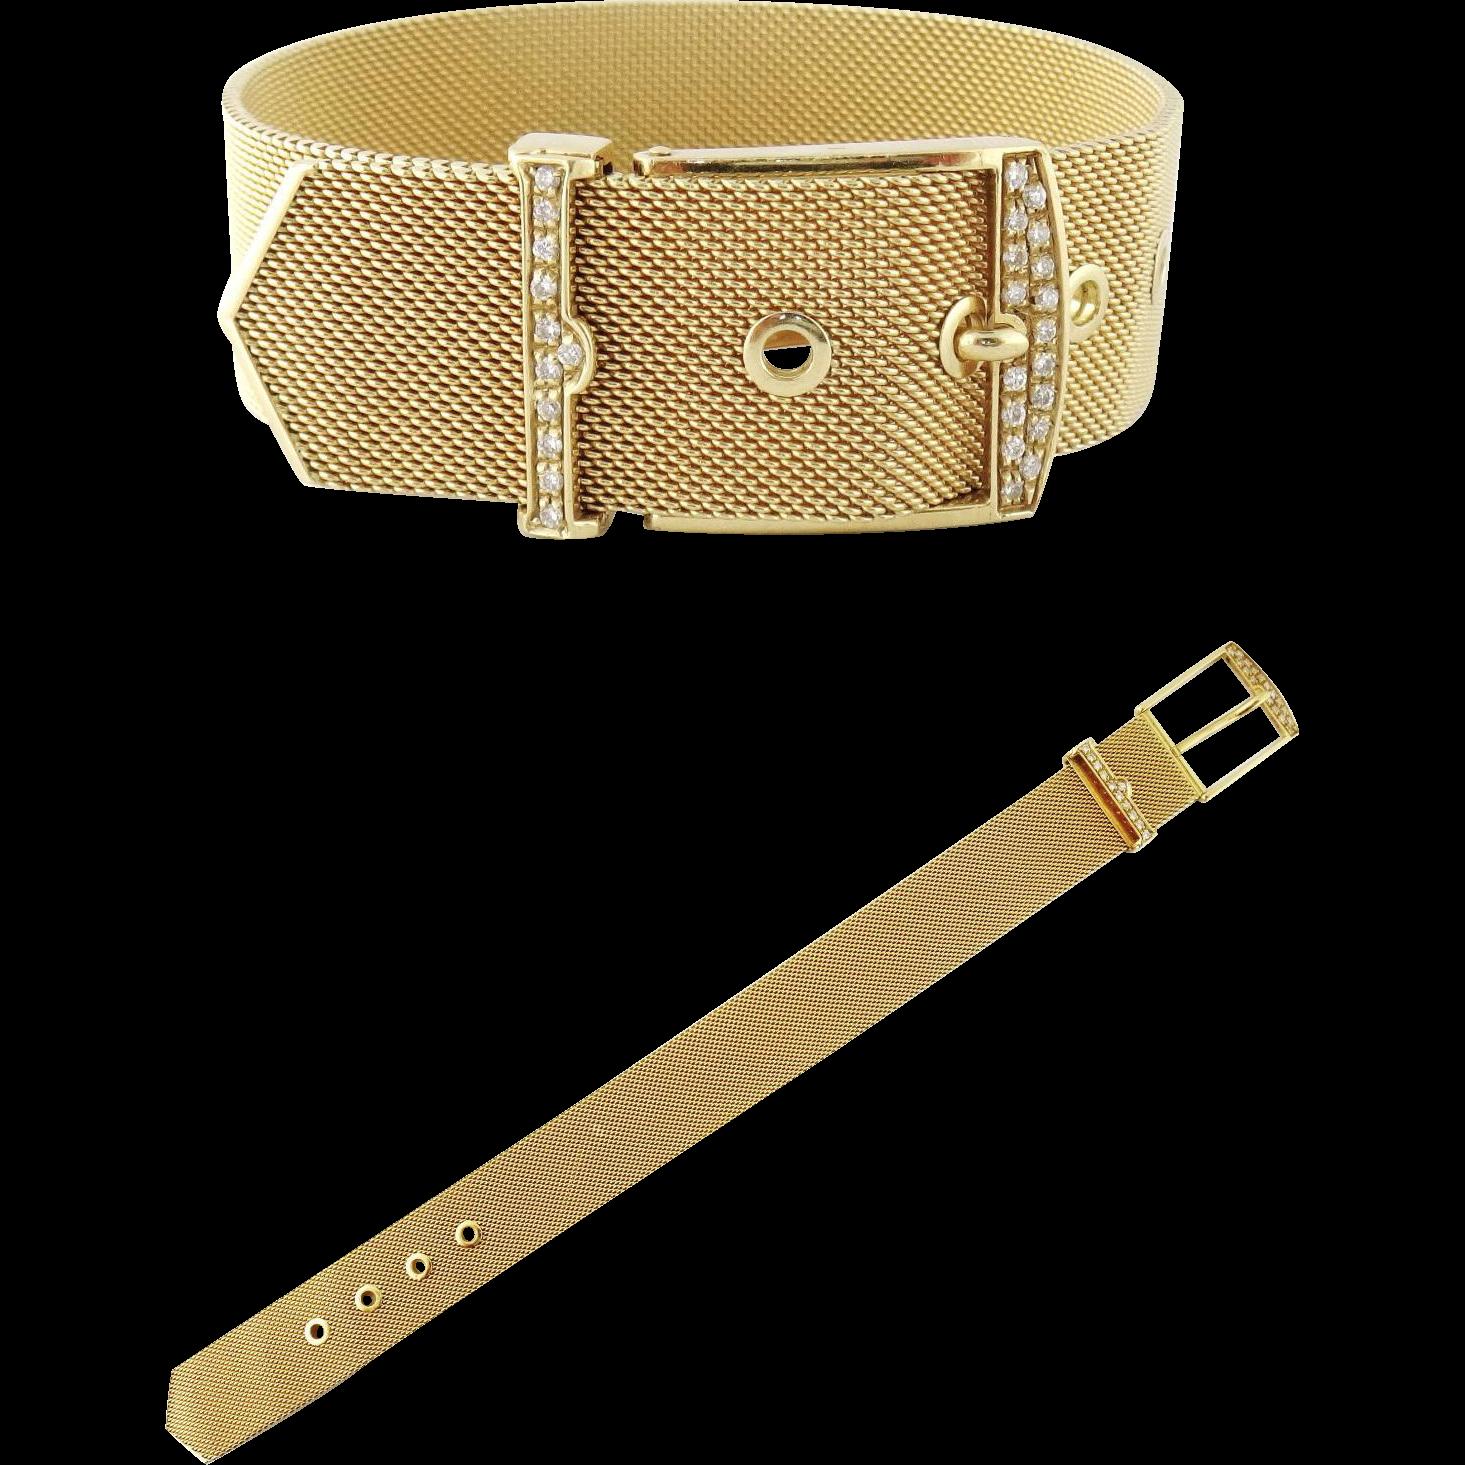 belt buckle brown buckle ornate belt buckle Vintage buckle retro belt buckle buckle round buckle retro buckle vintage belt buckle